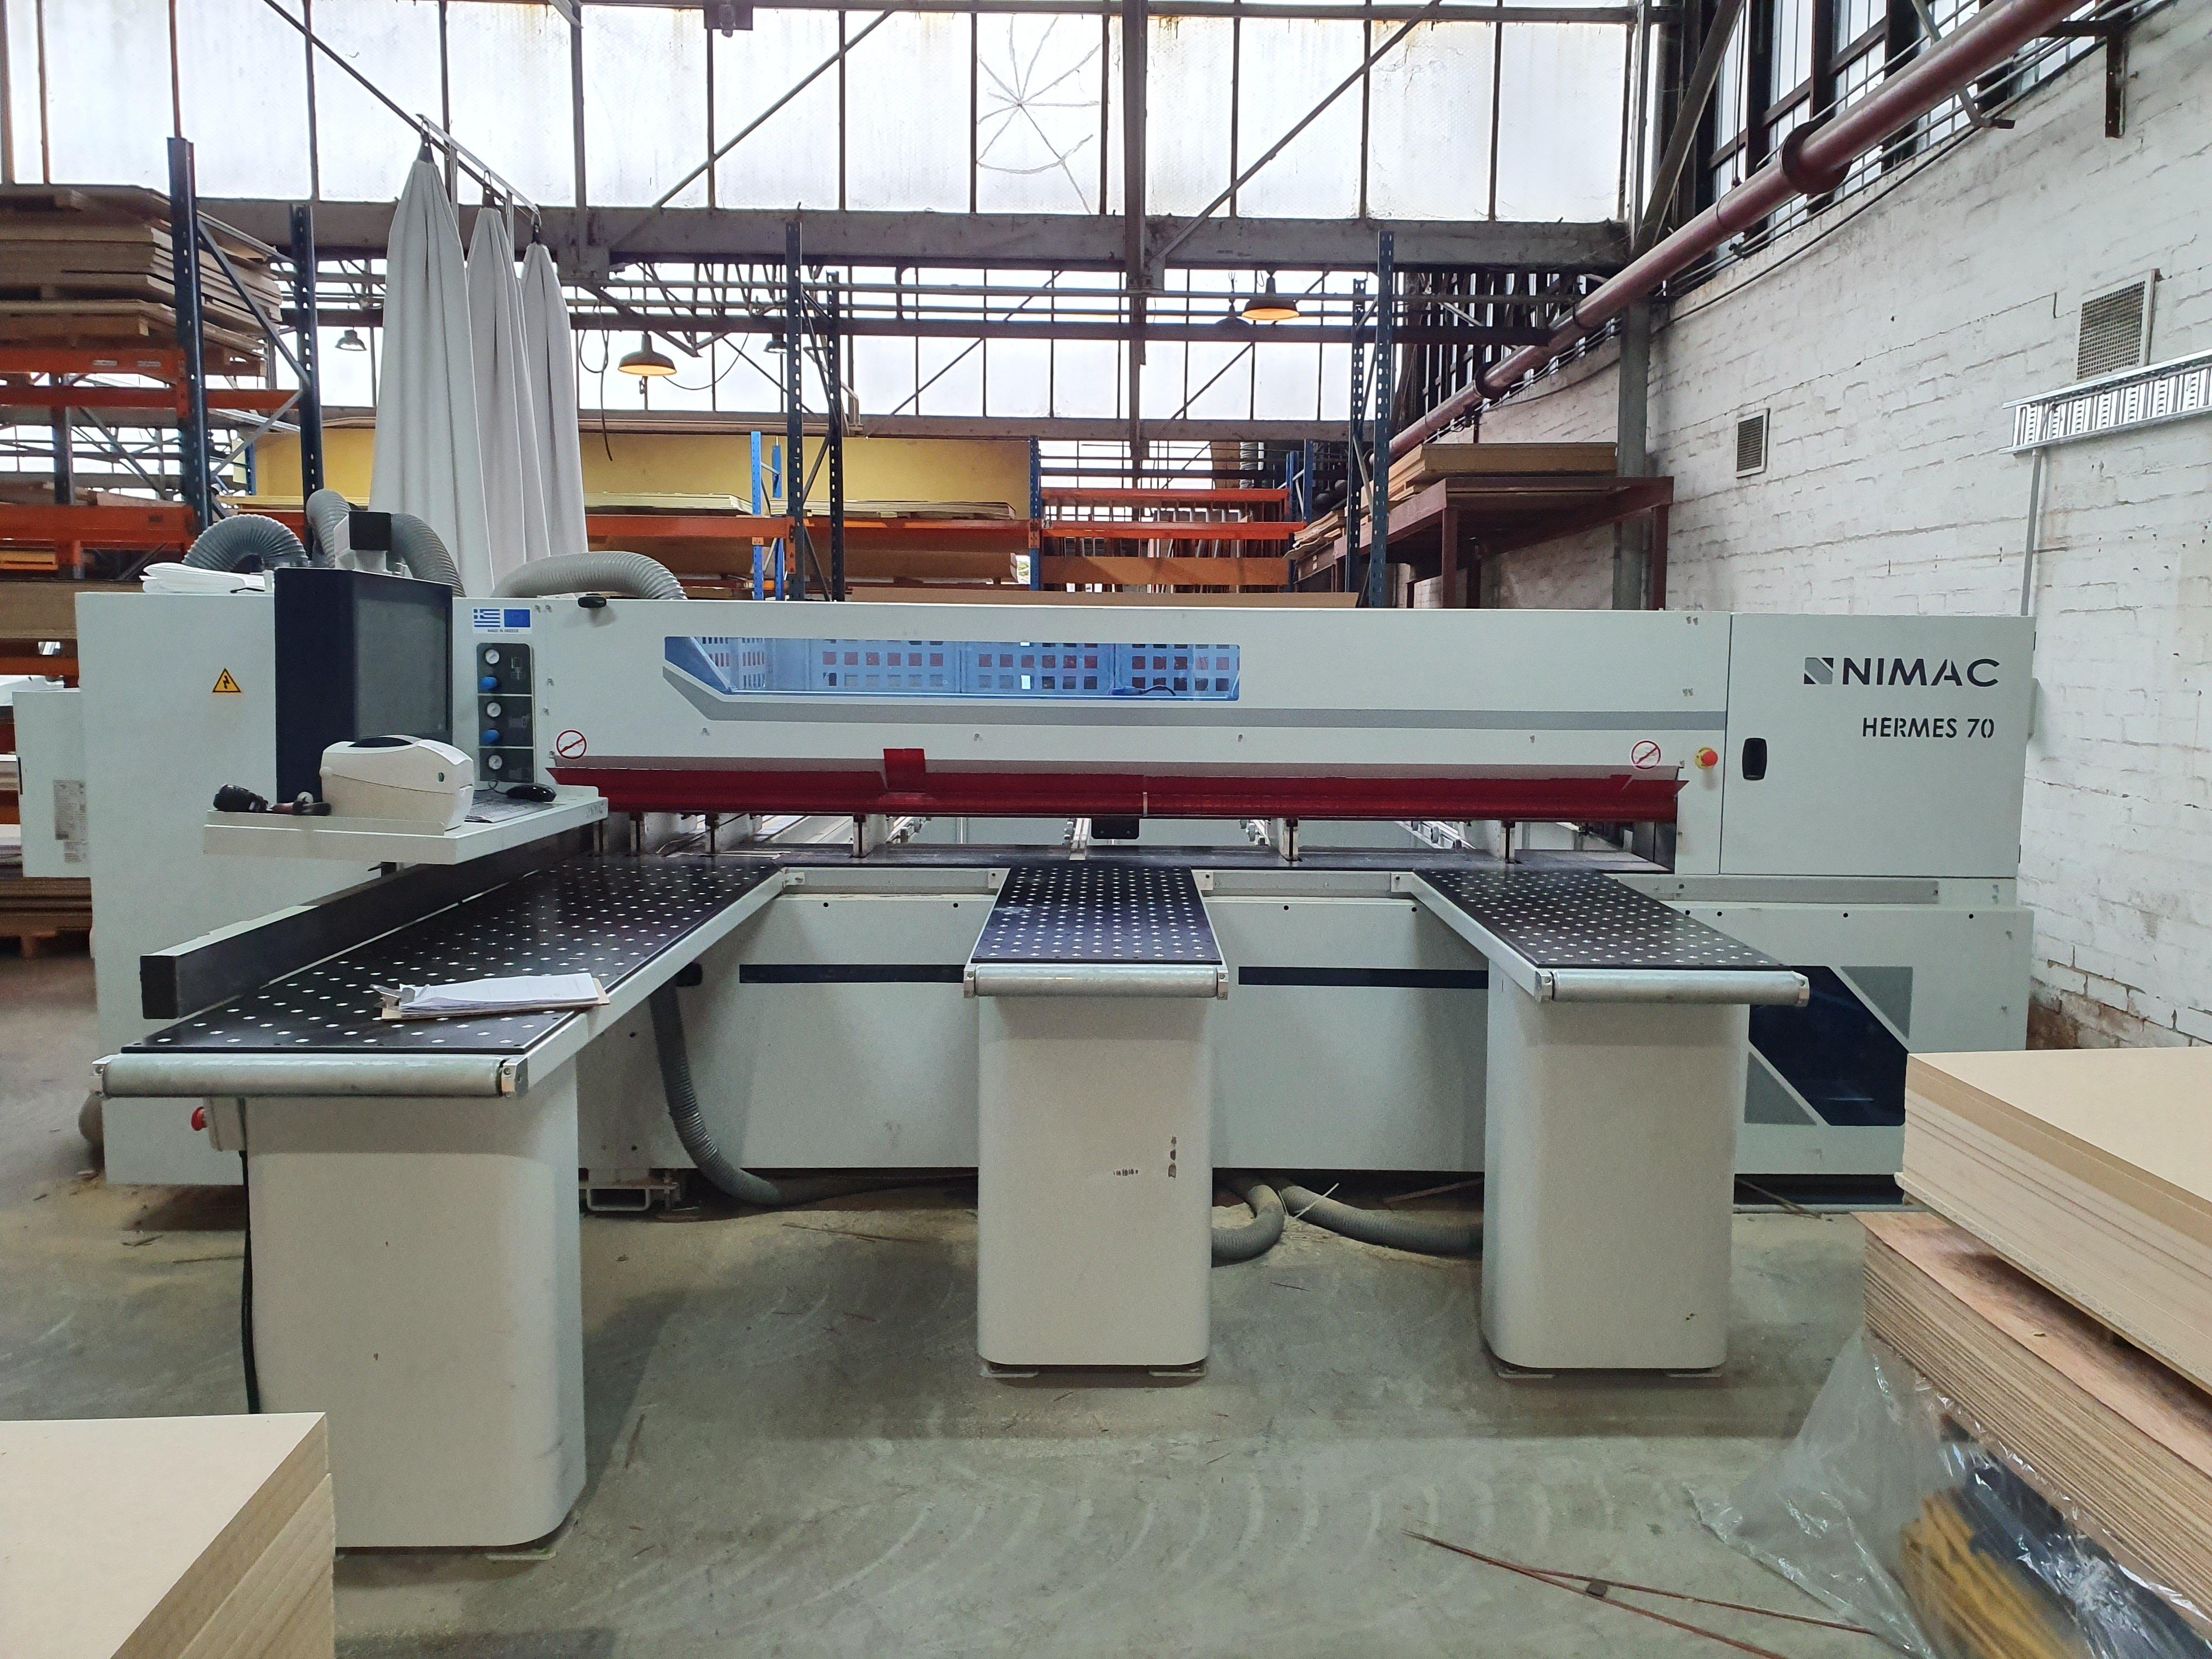 Plyco's NIMAC Hermes 70 CNC machine